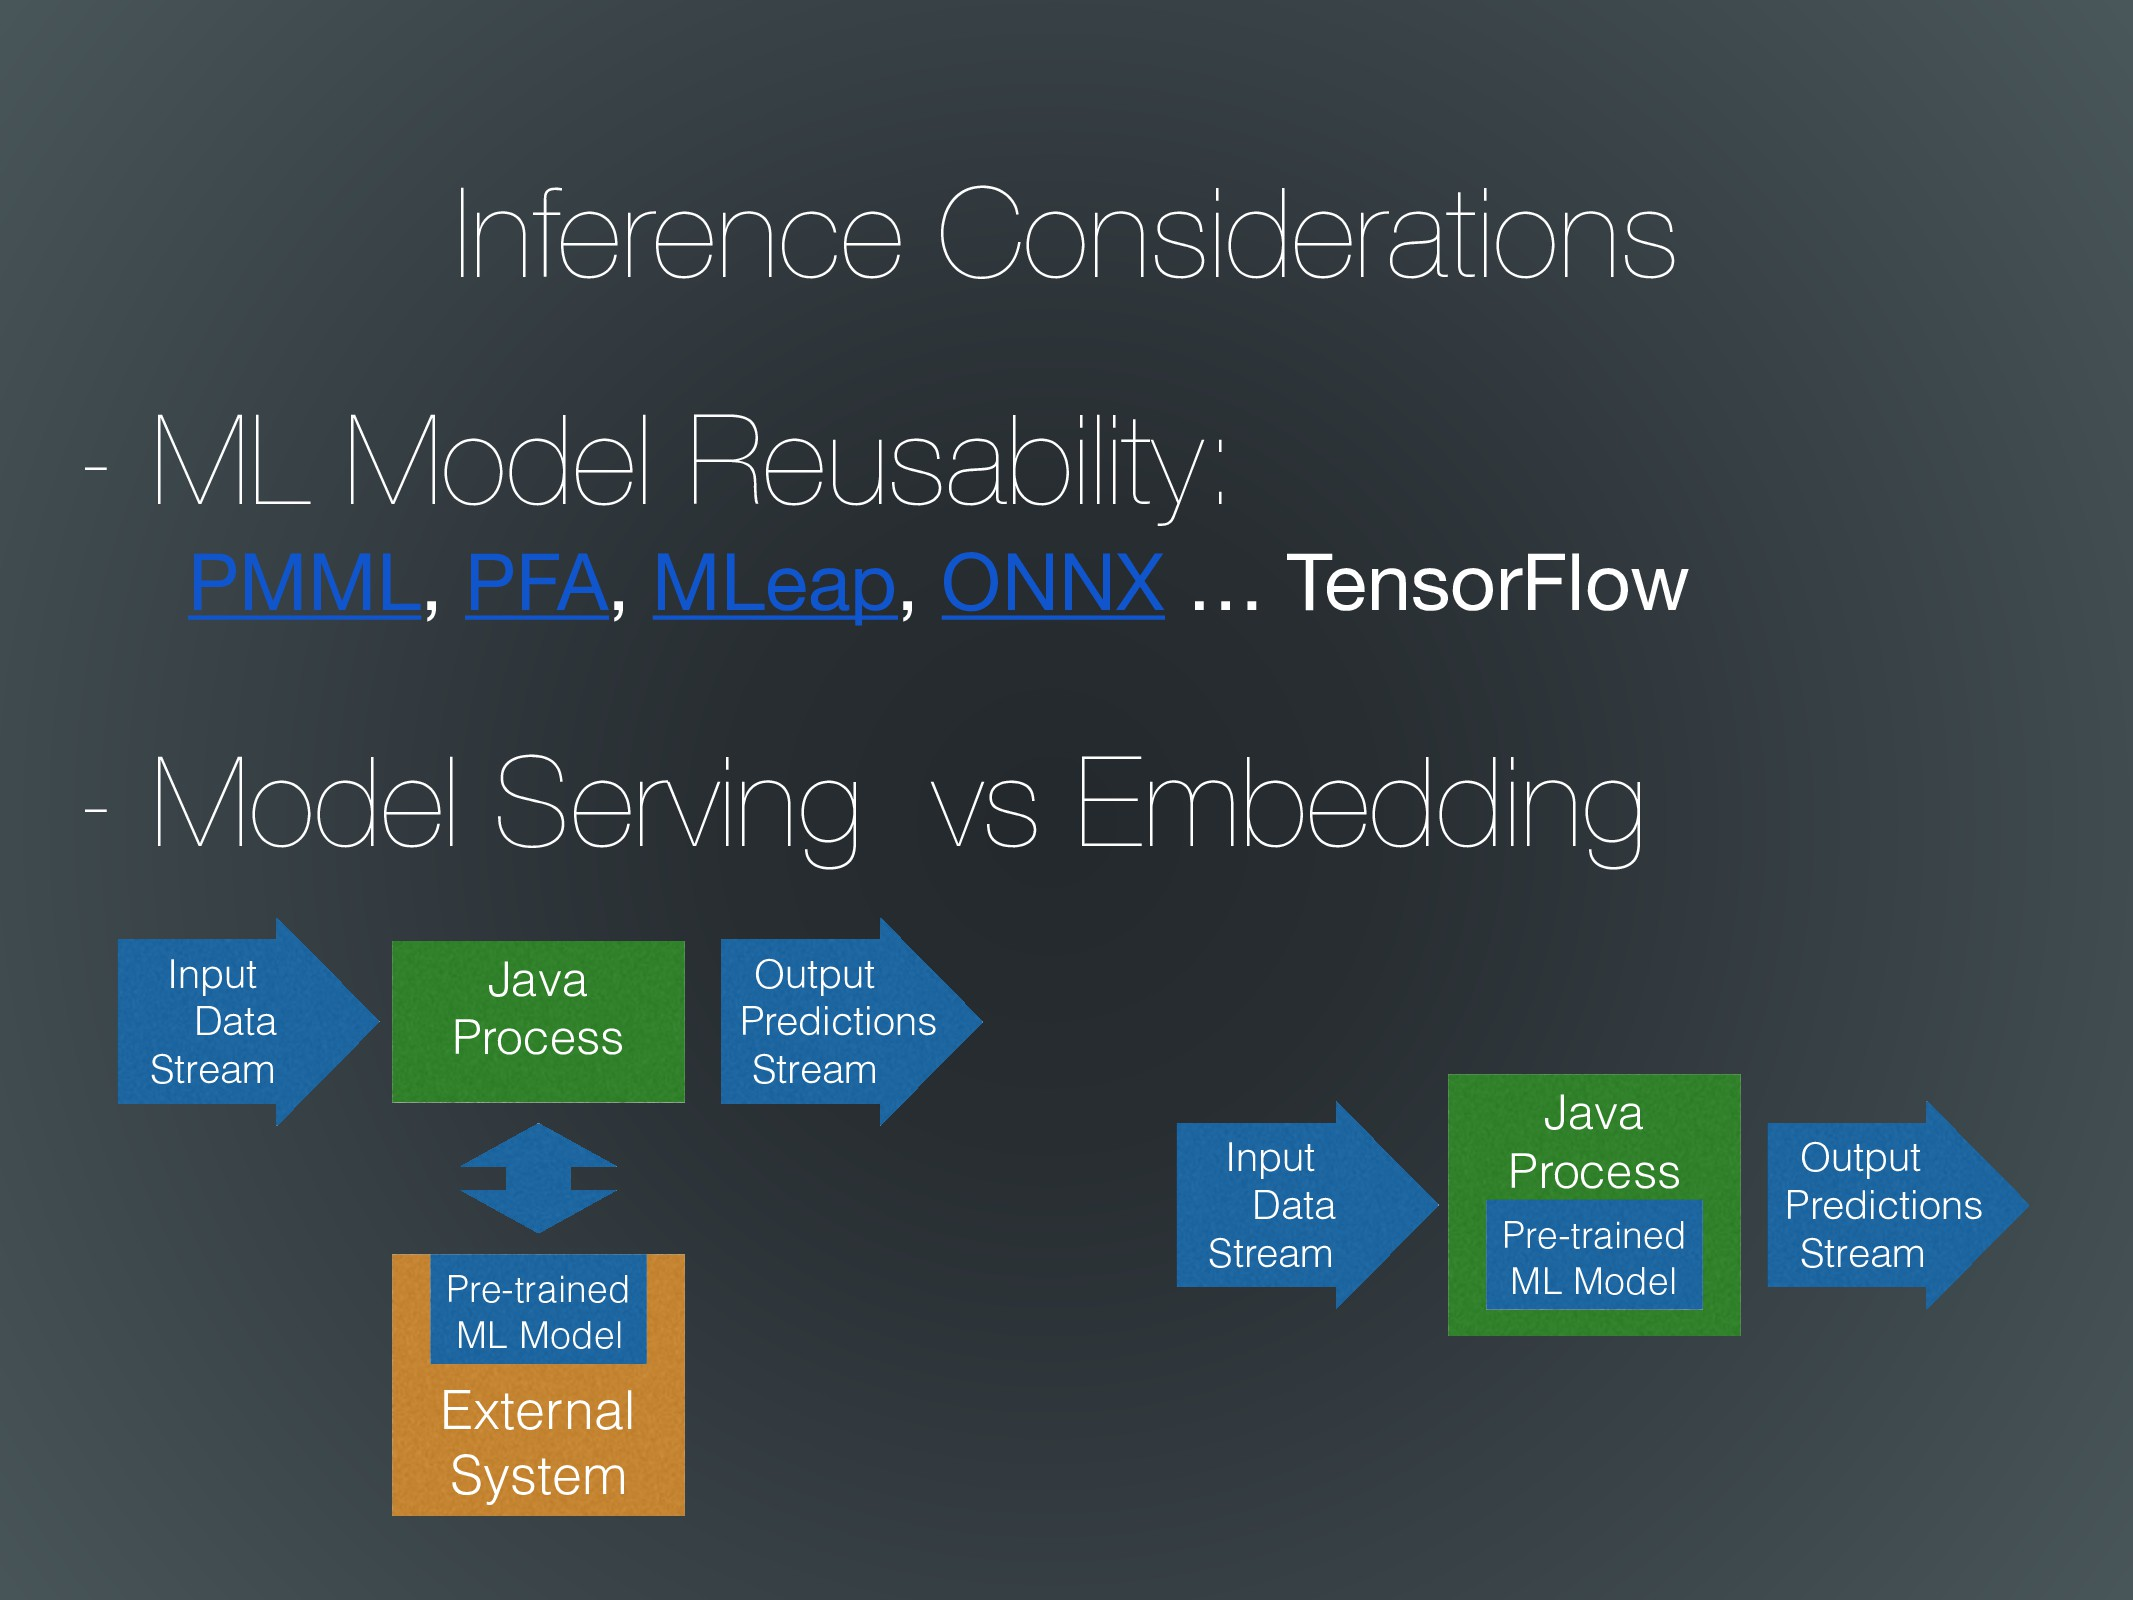 - ML Model Reusability: PMML, PFA, MLeap, ONNX ...